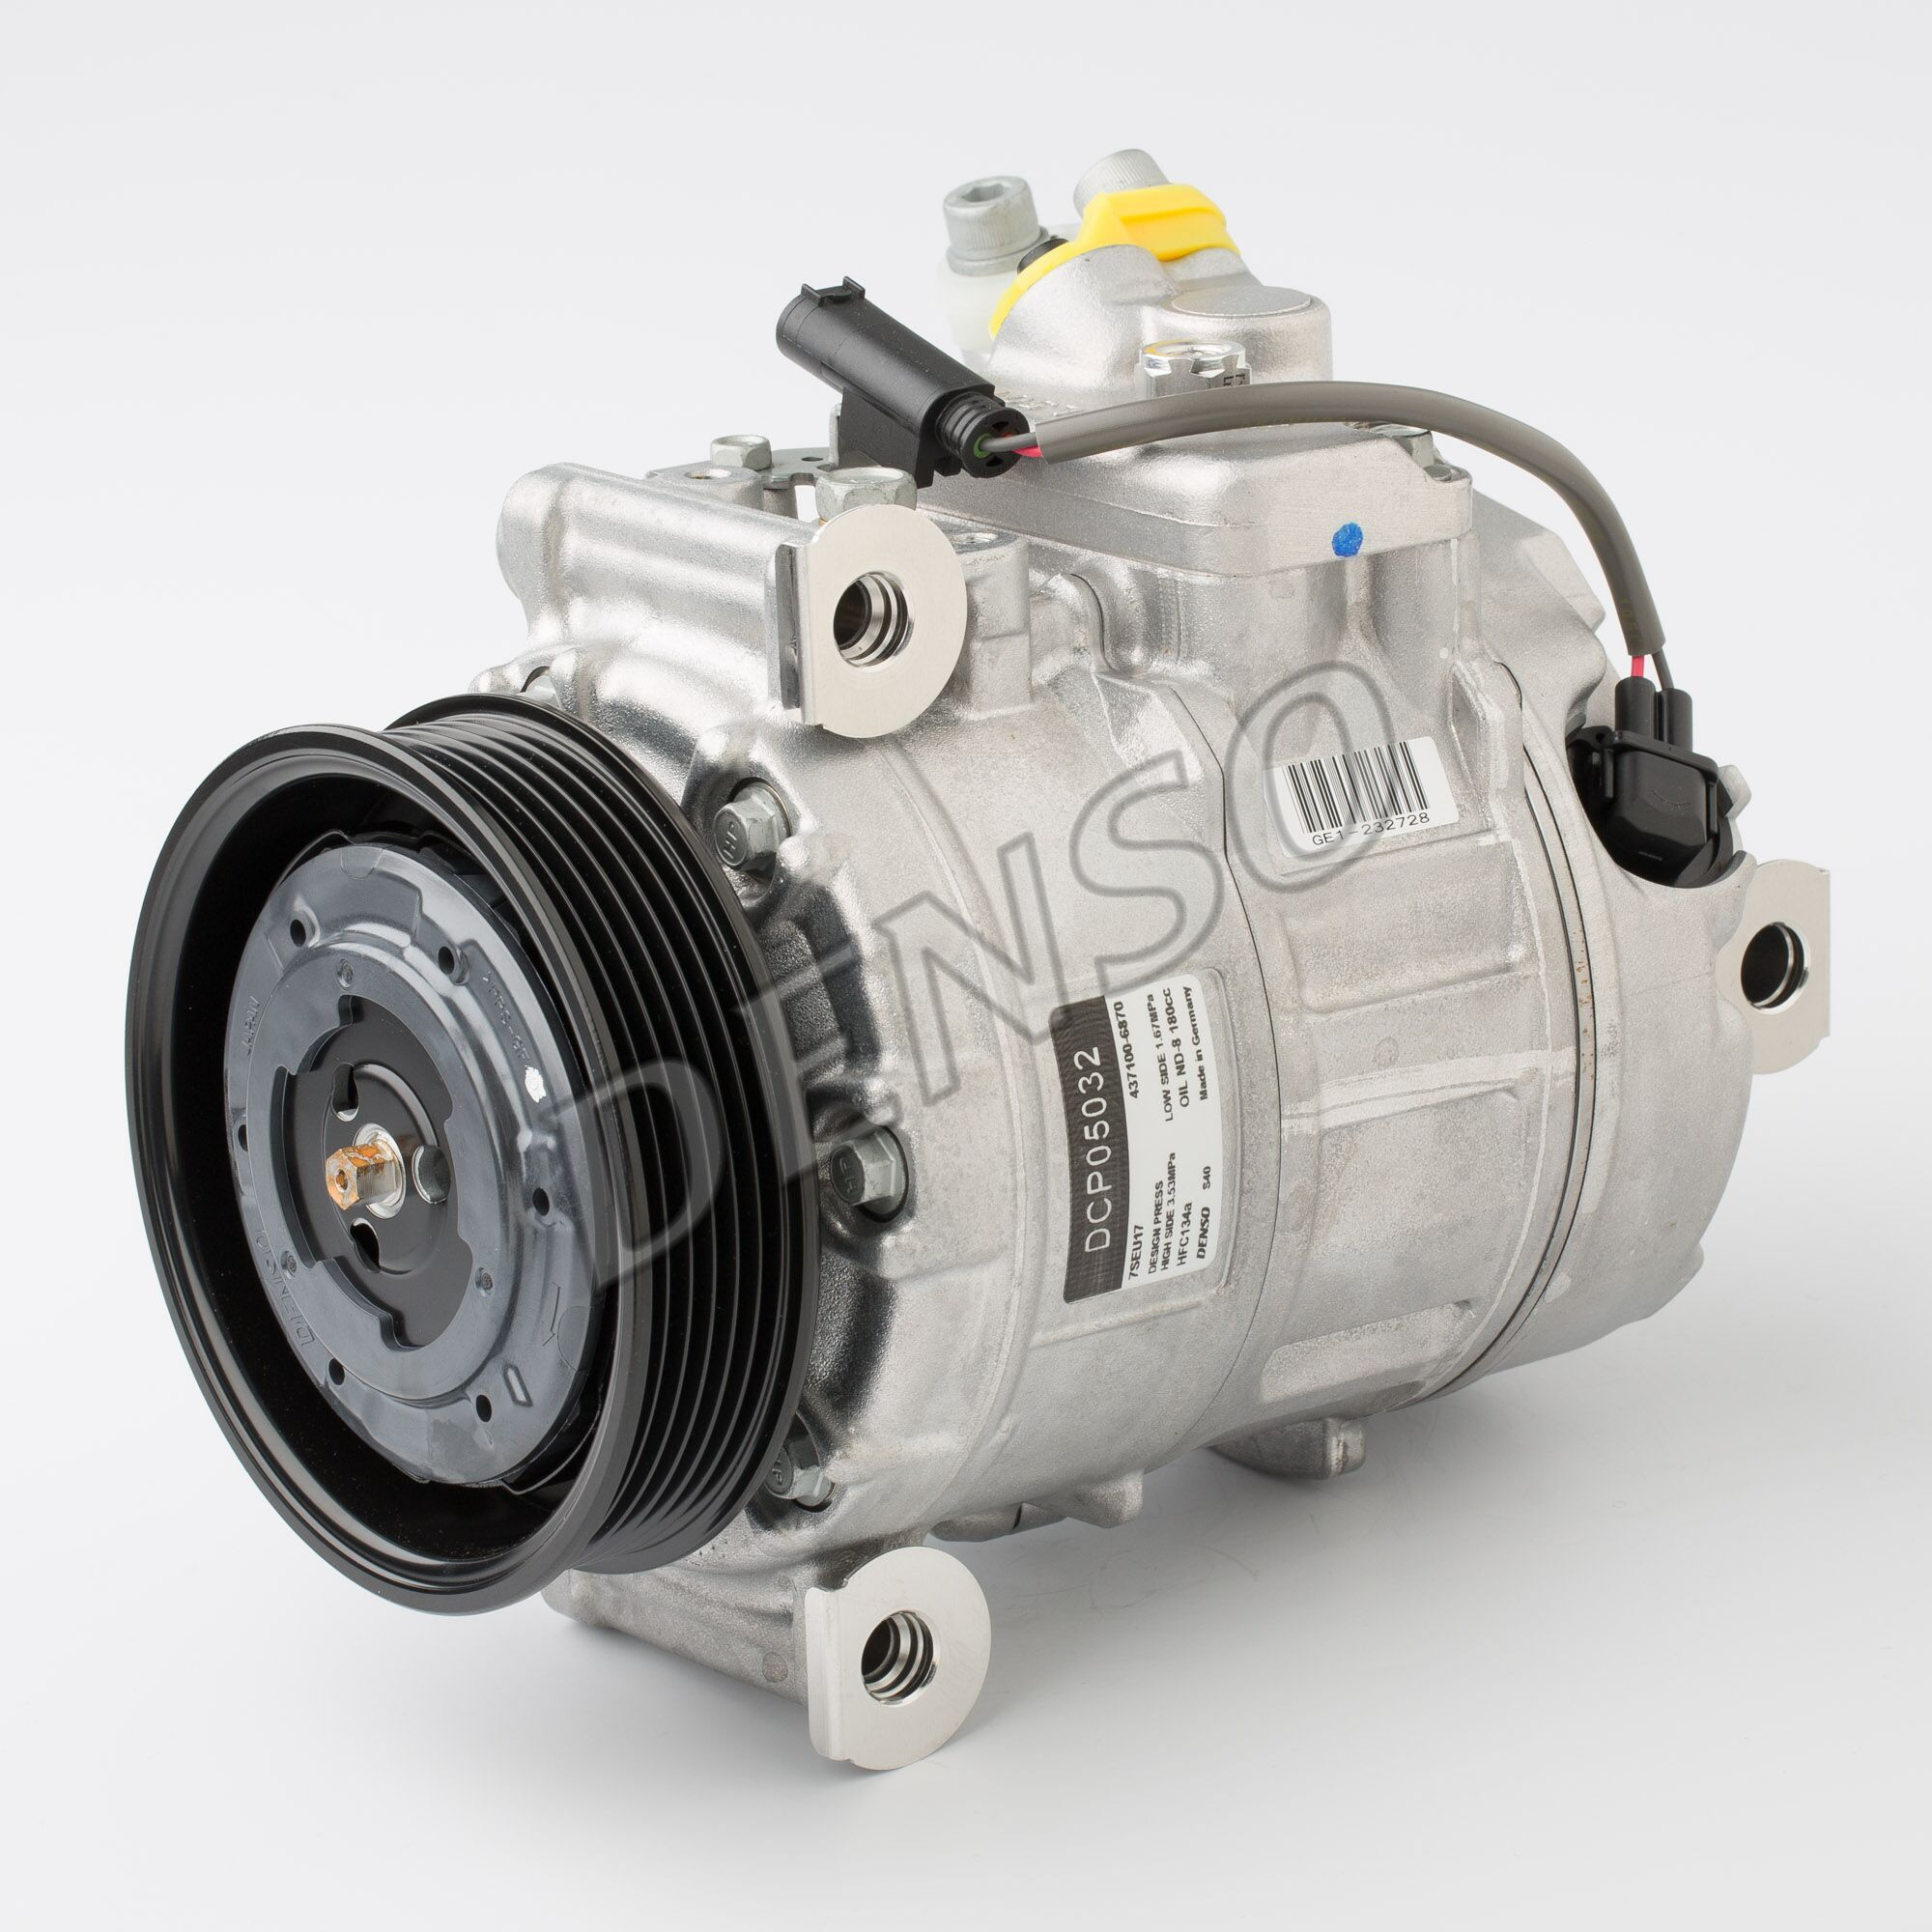 Kompressor Klimaanlage DCP05032 BMW 5er 2004